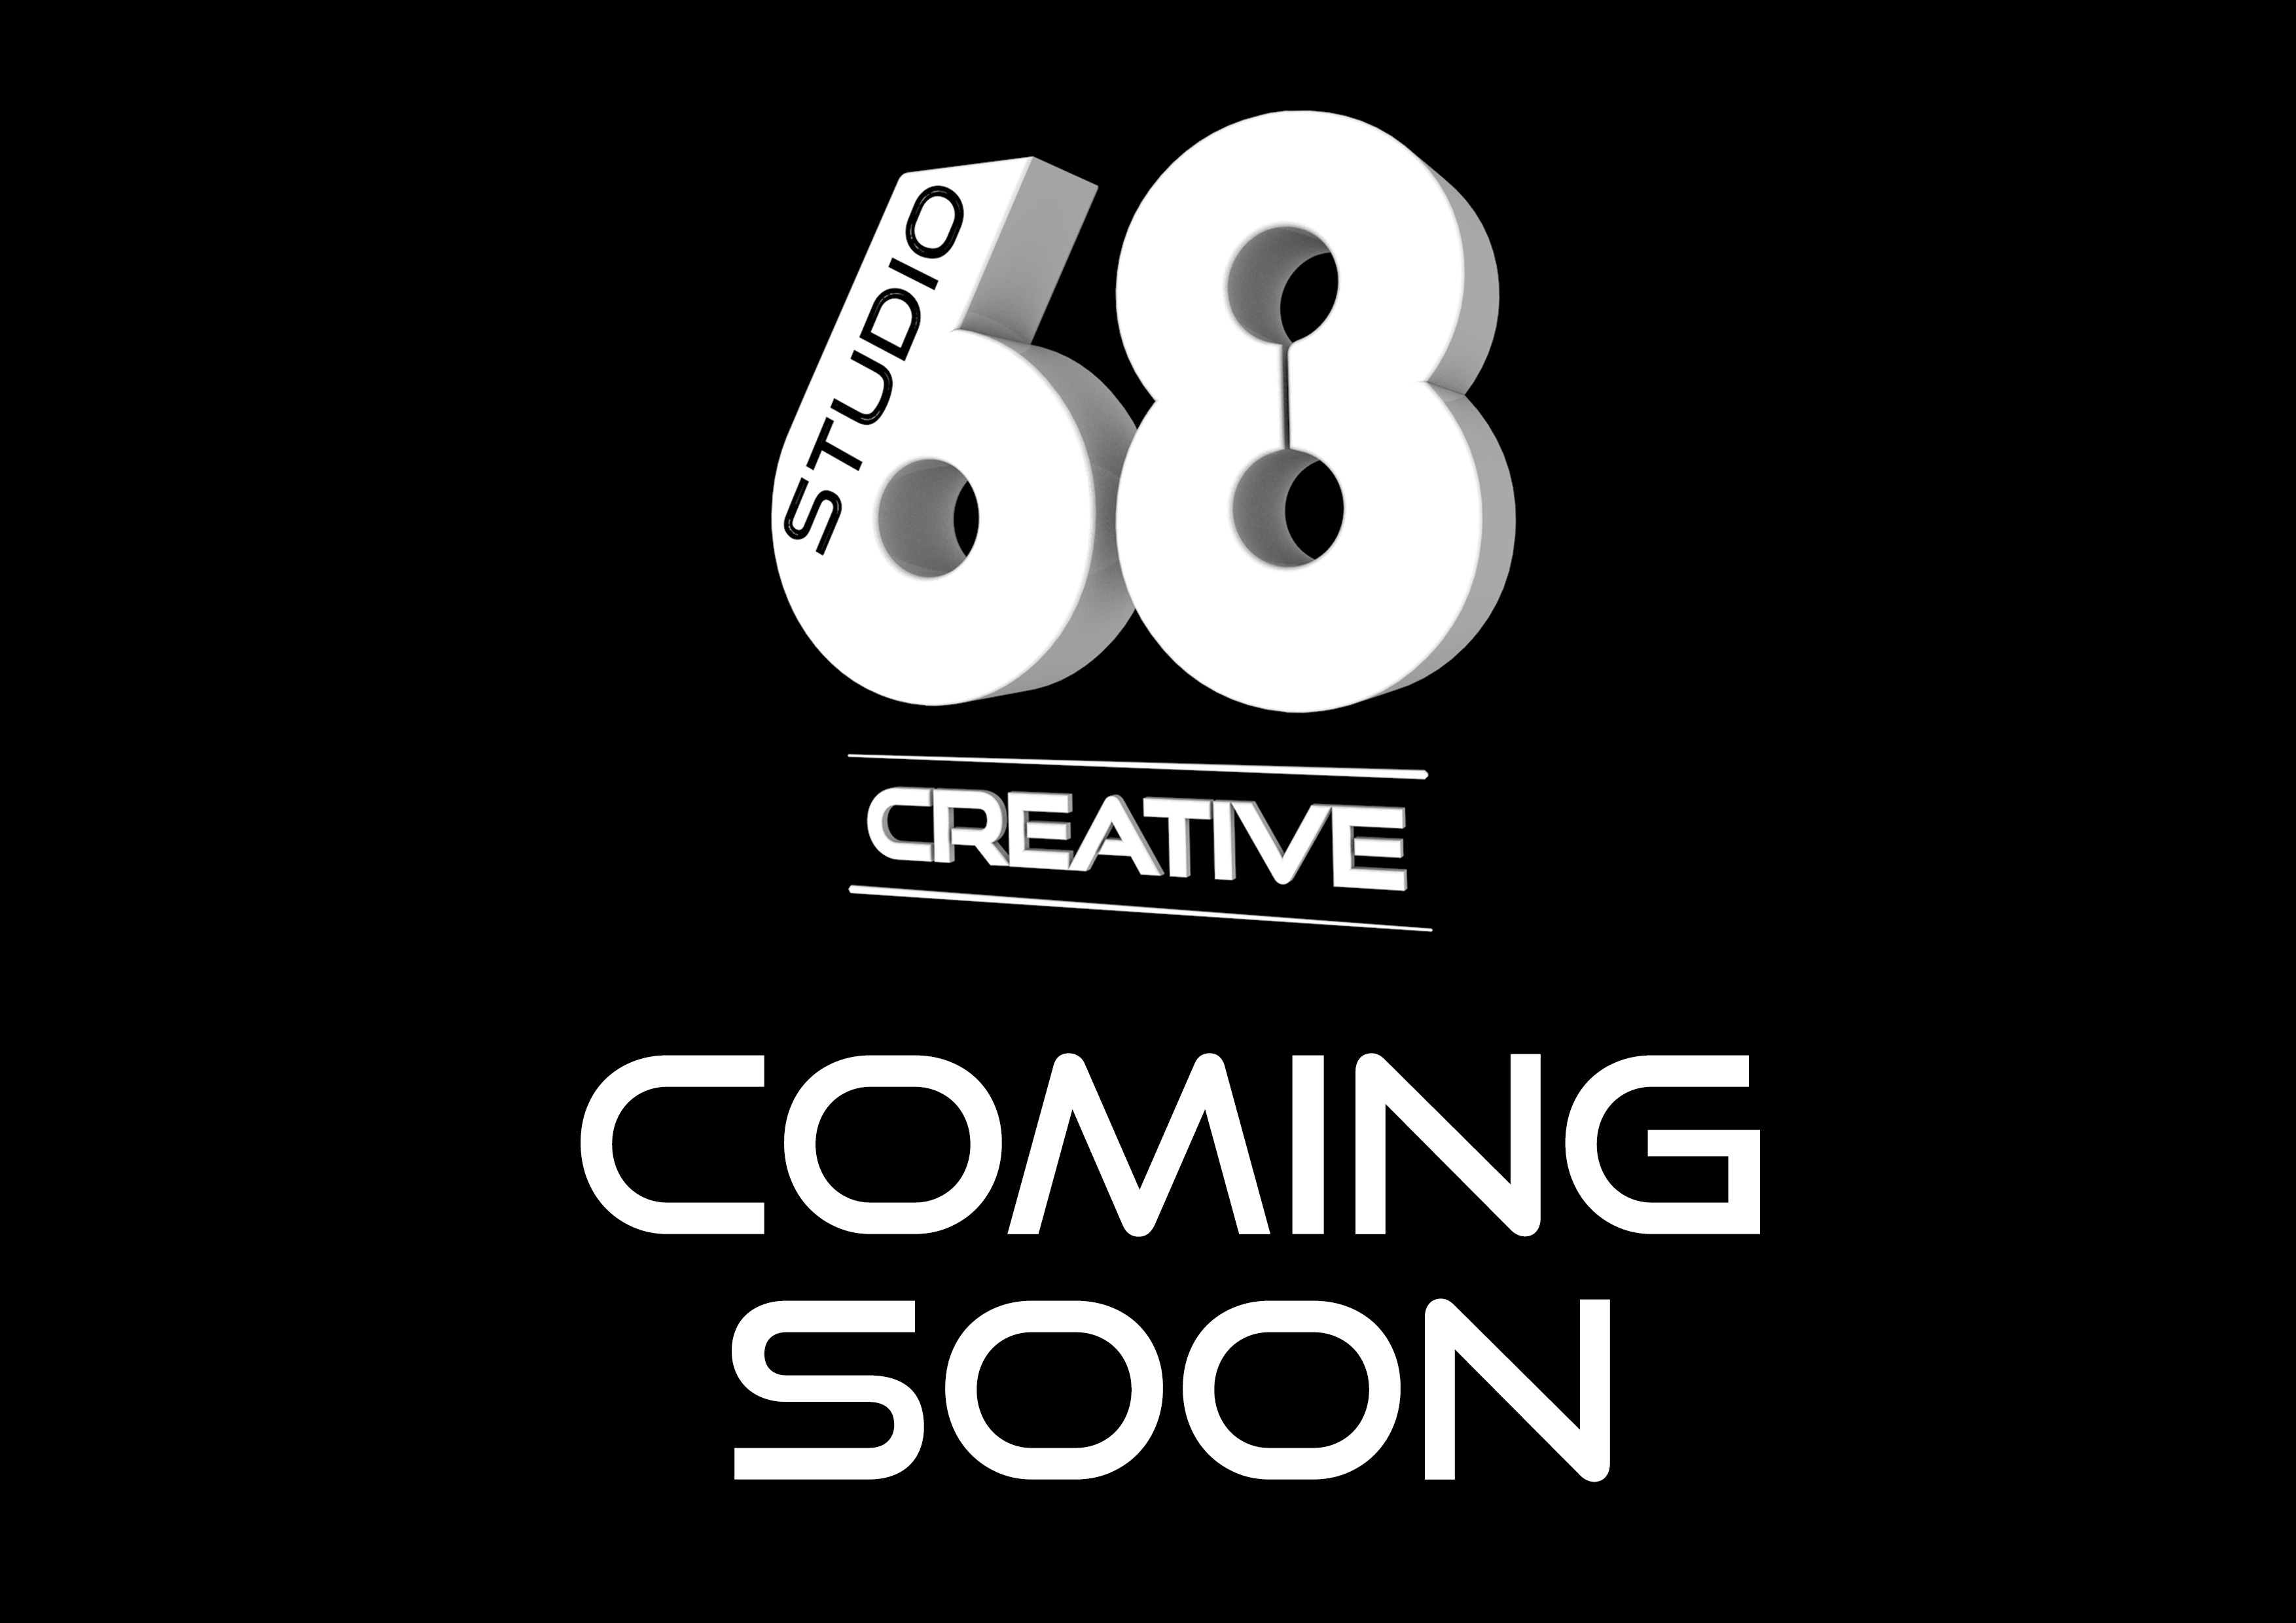 68 Creative coming soon